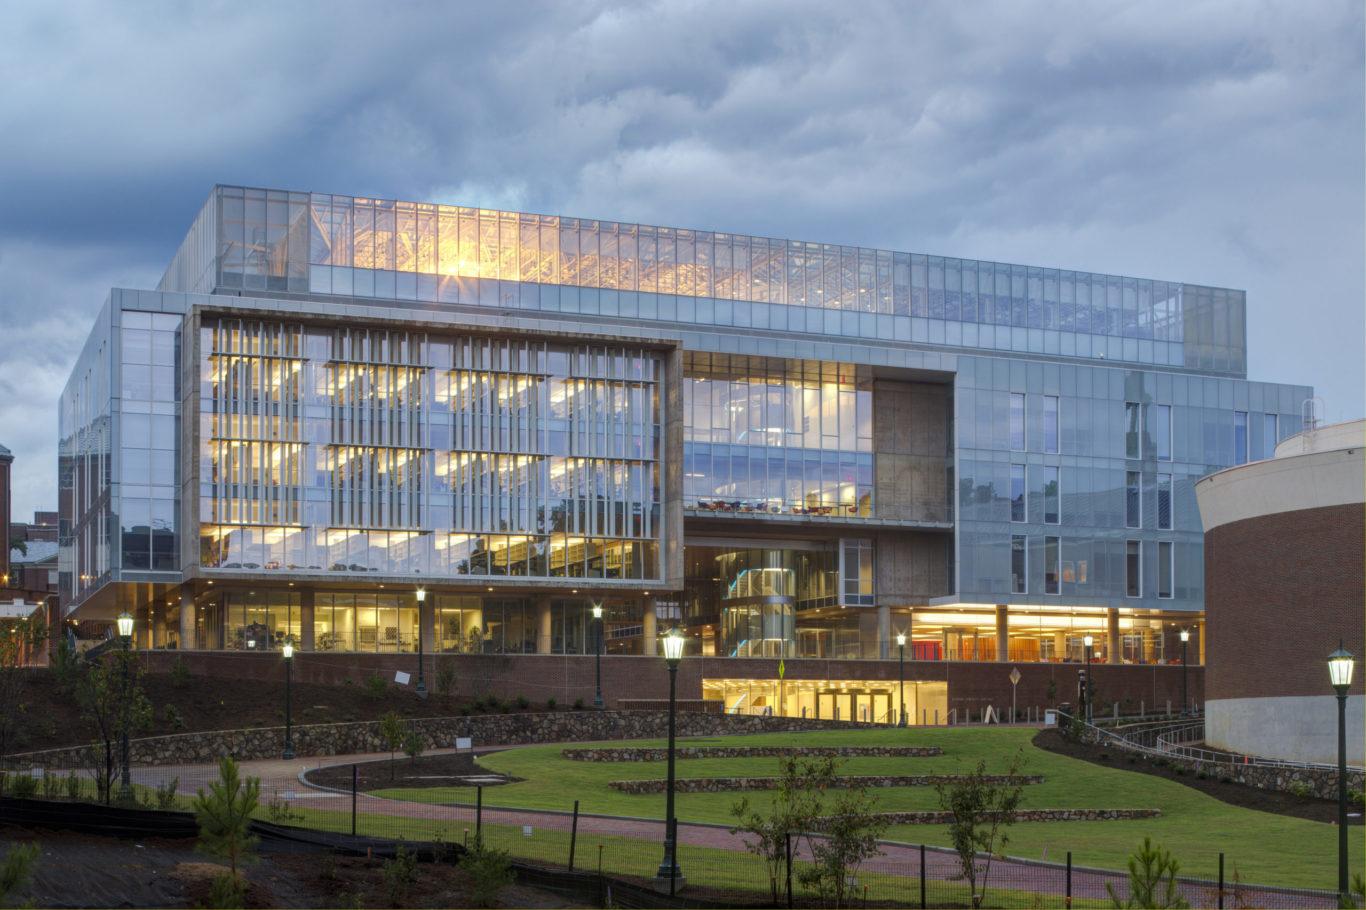 Slide 1 of 12, University of North Carolina Genome Science Building